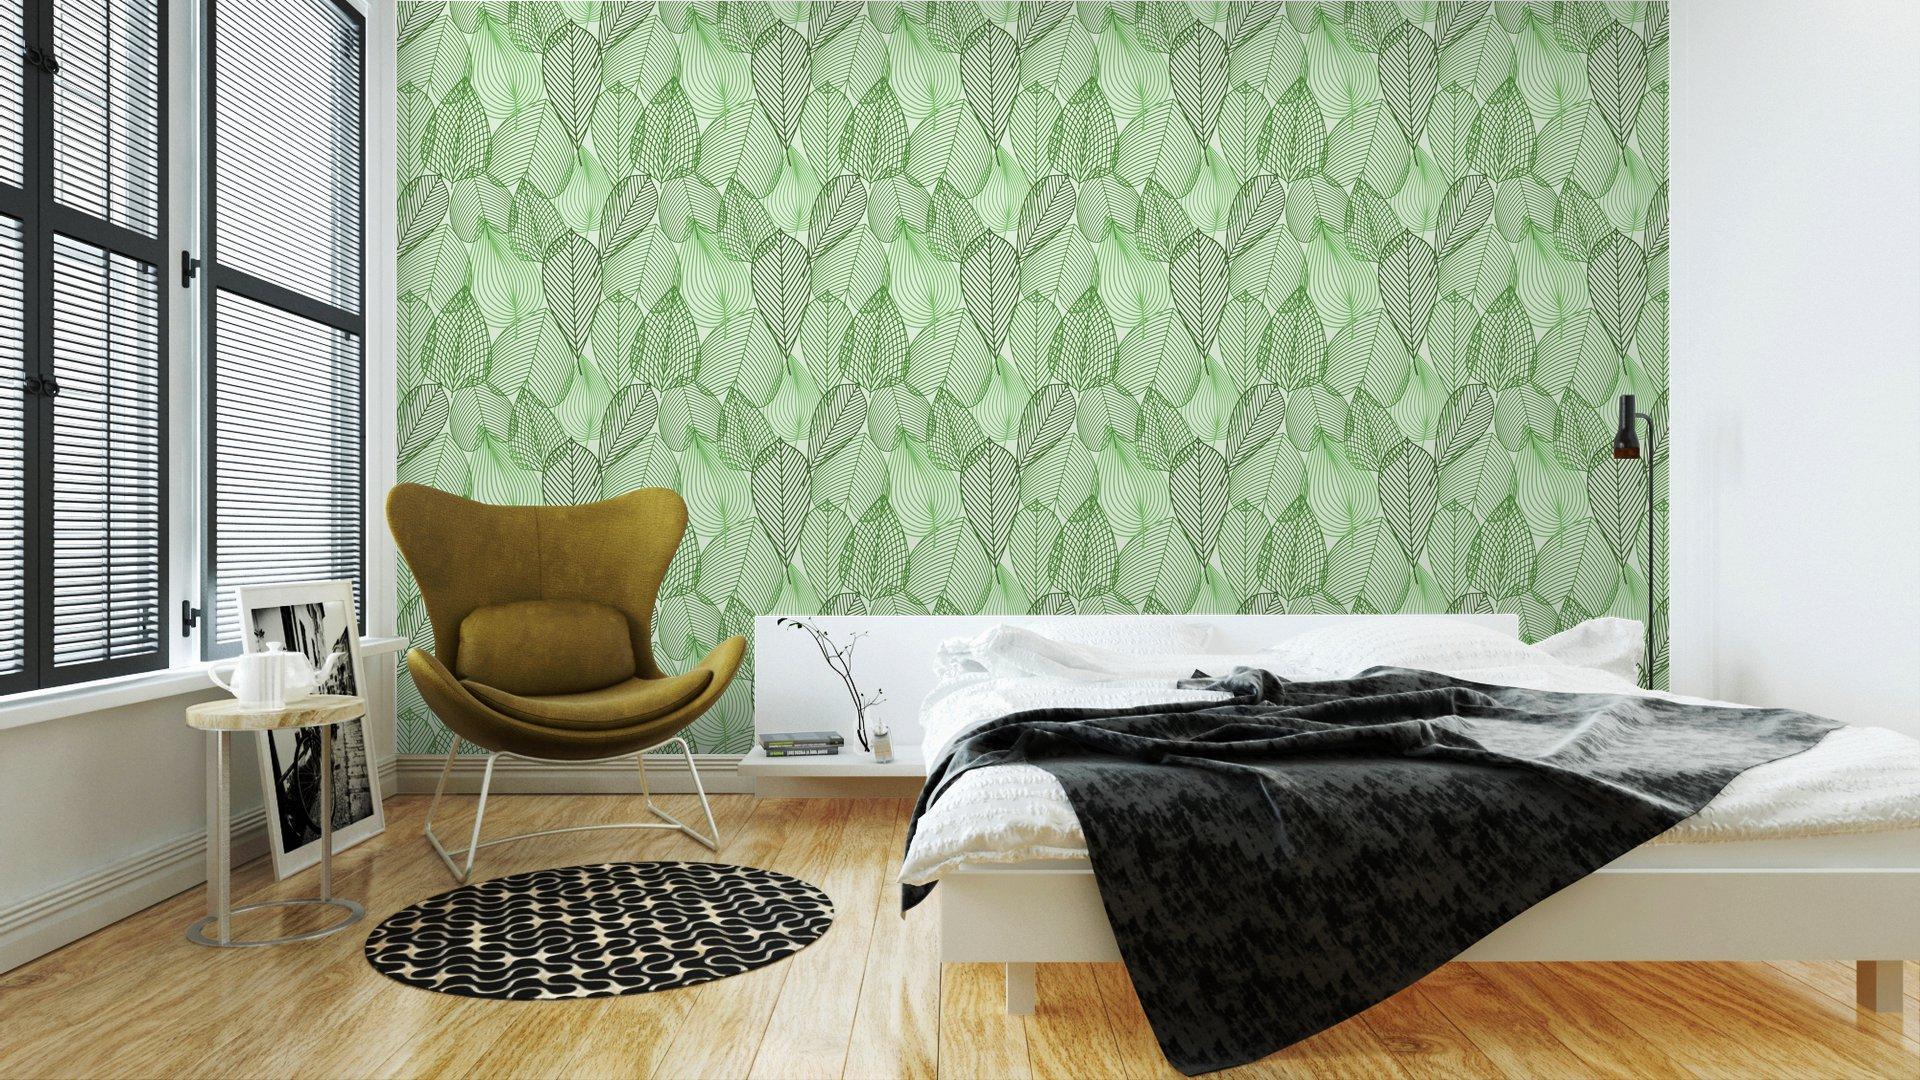 Fotomurales mexico papeles pintados primavera verde deja el modelo inconsutil 2 - Papel Tapiz Primavera Hoja Verde 01